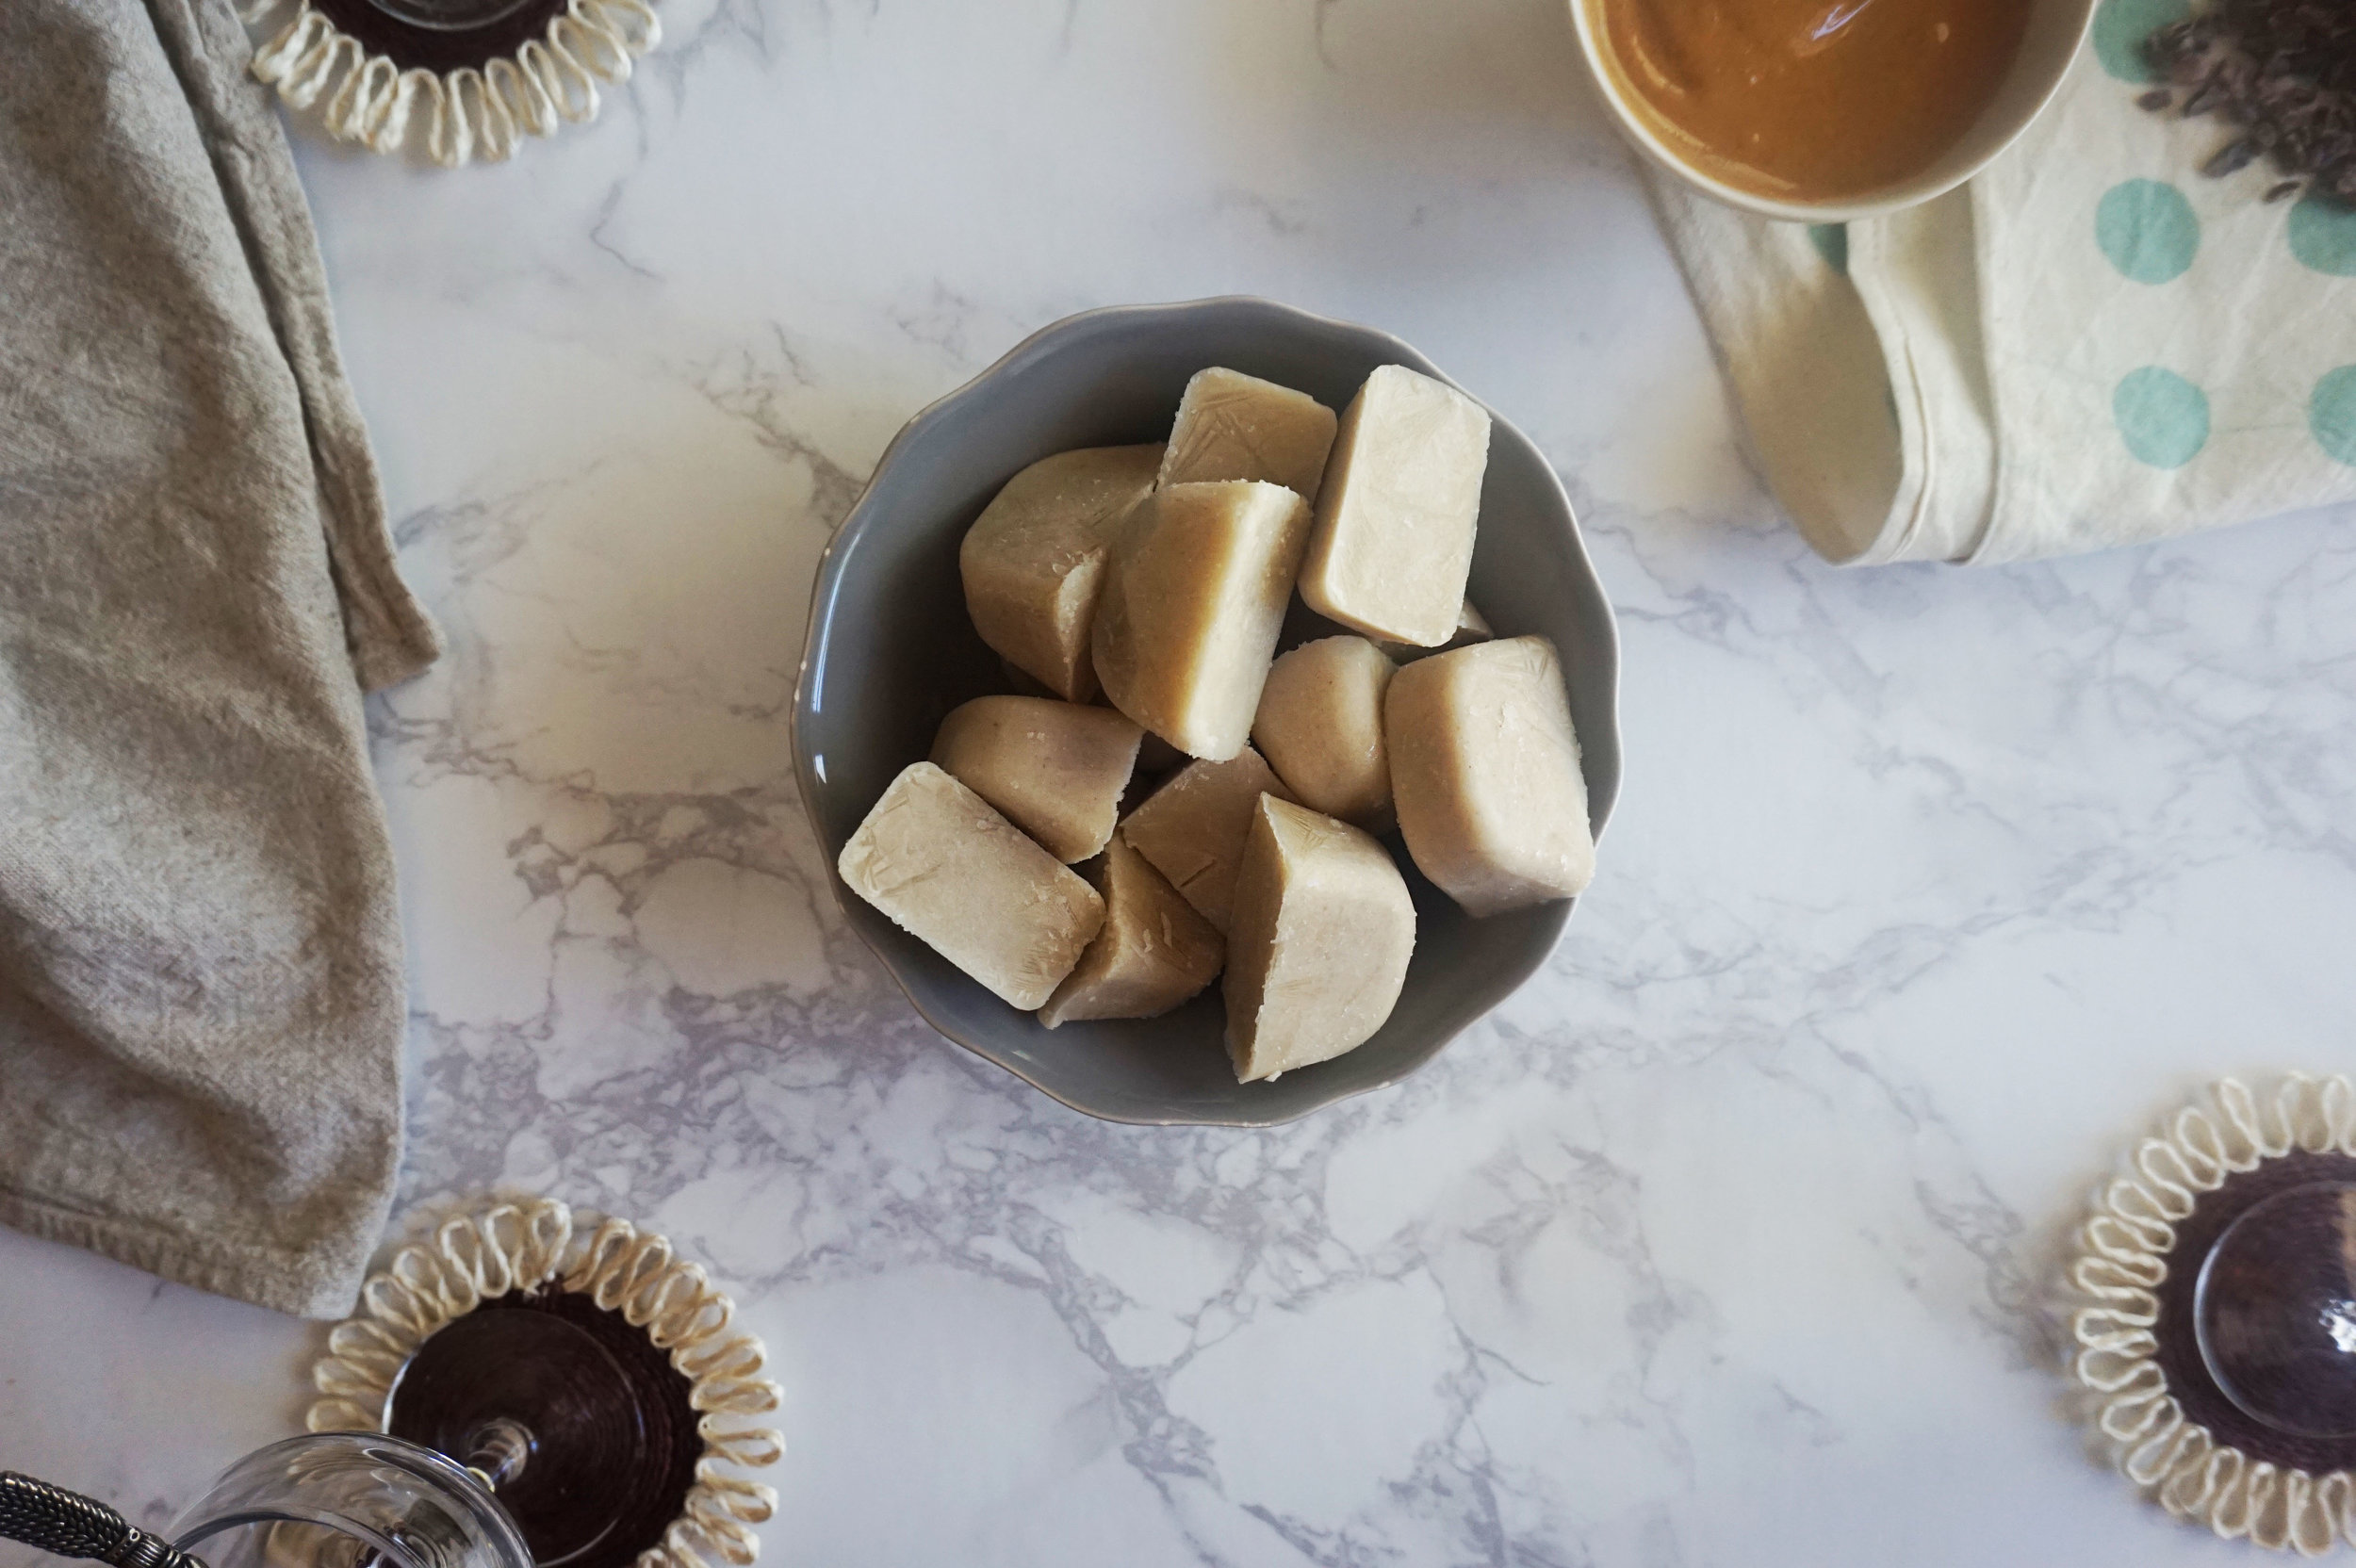 Prep the Cashew Milk ice cubes